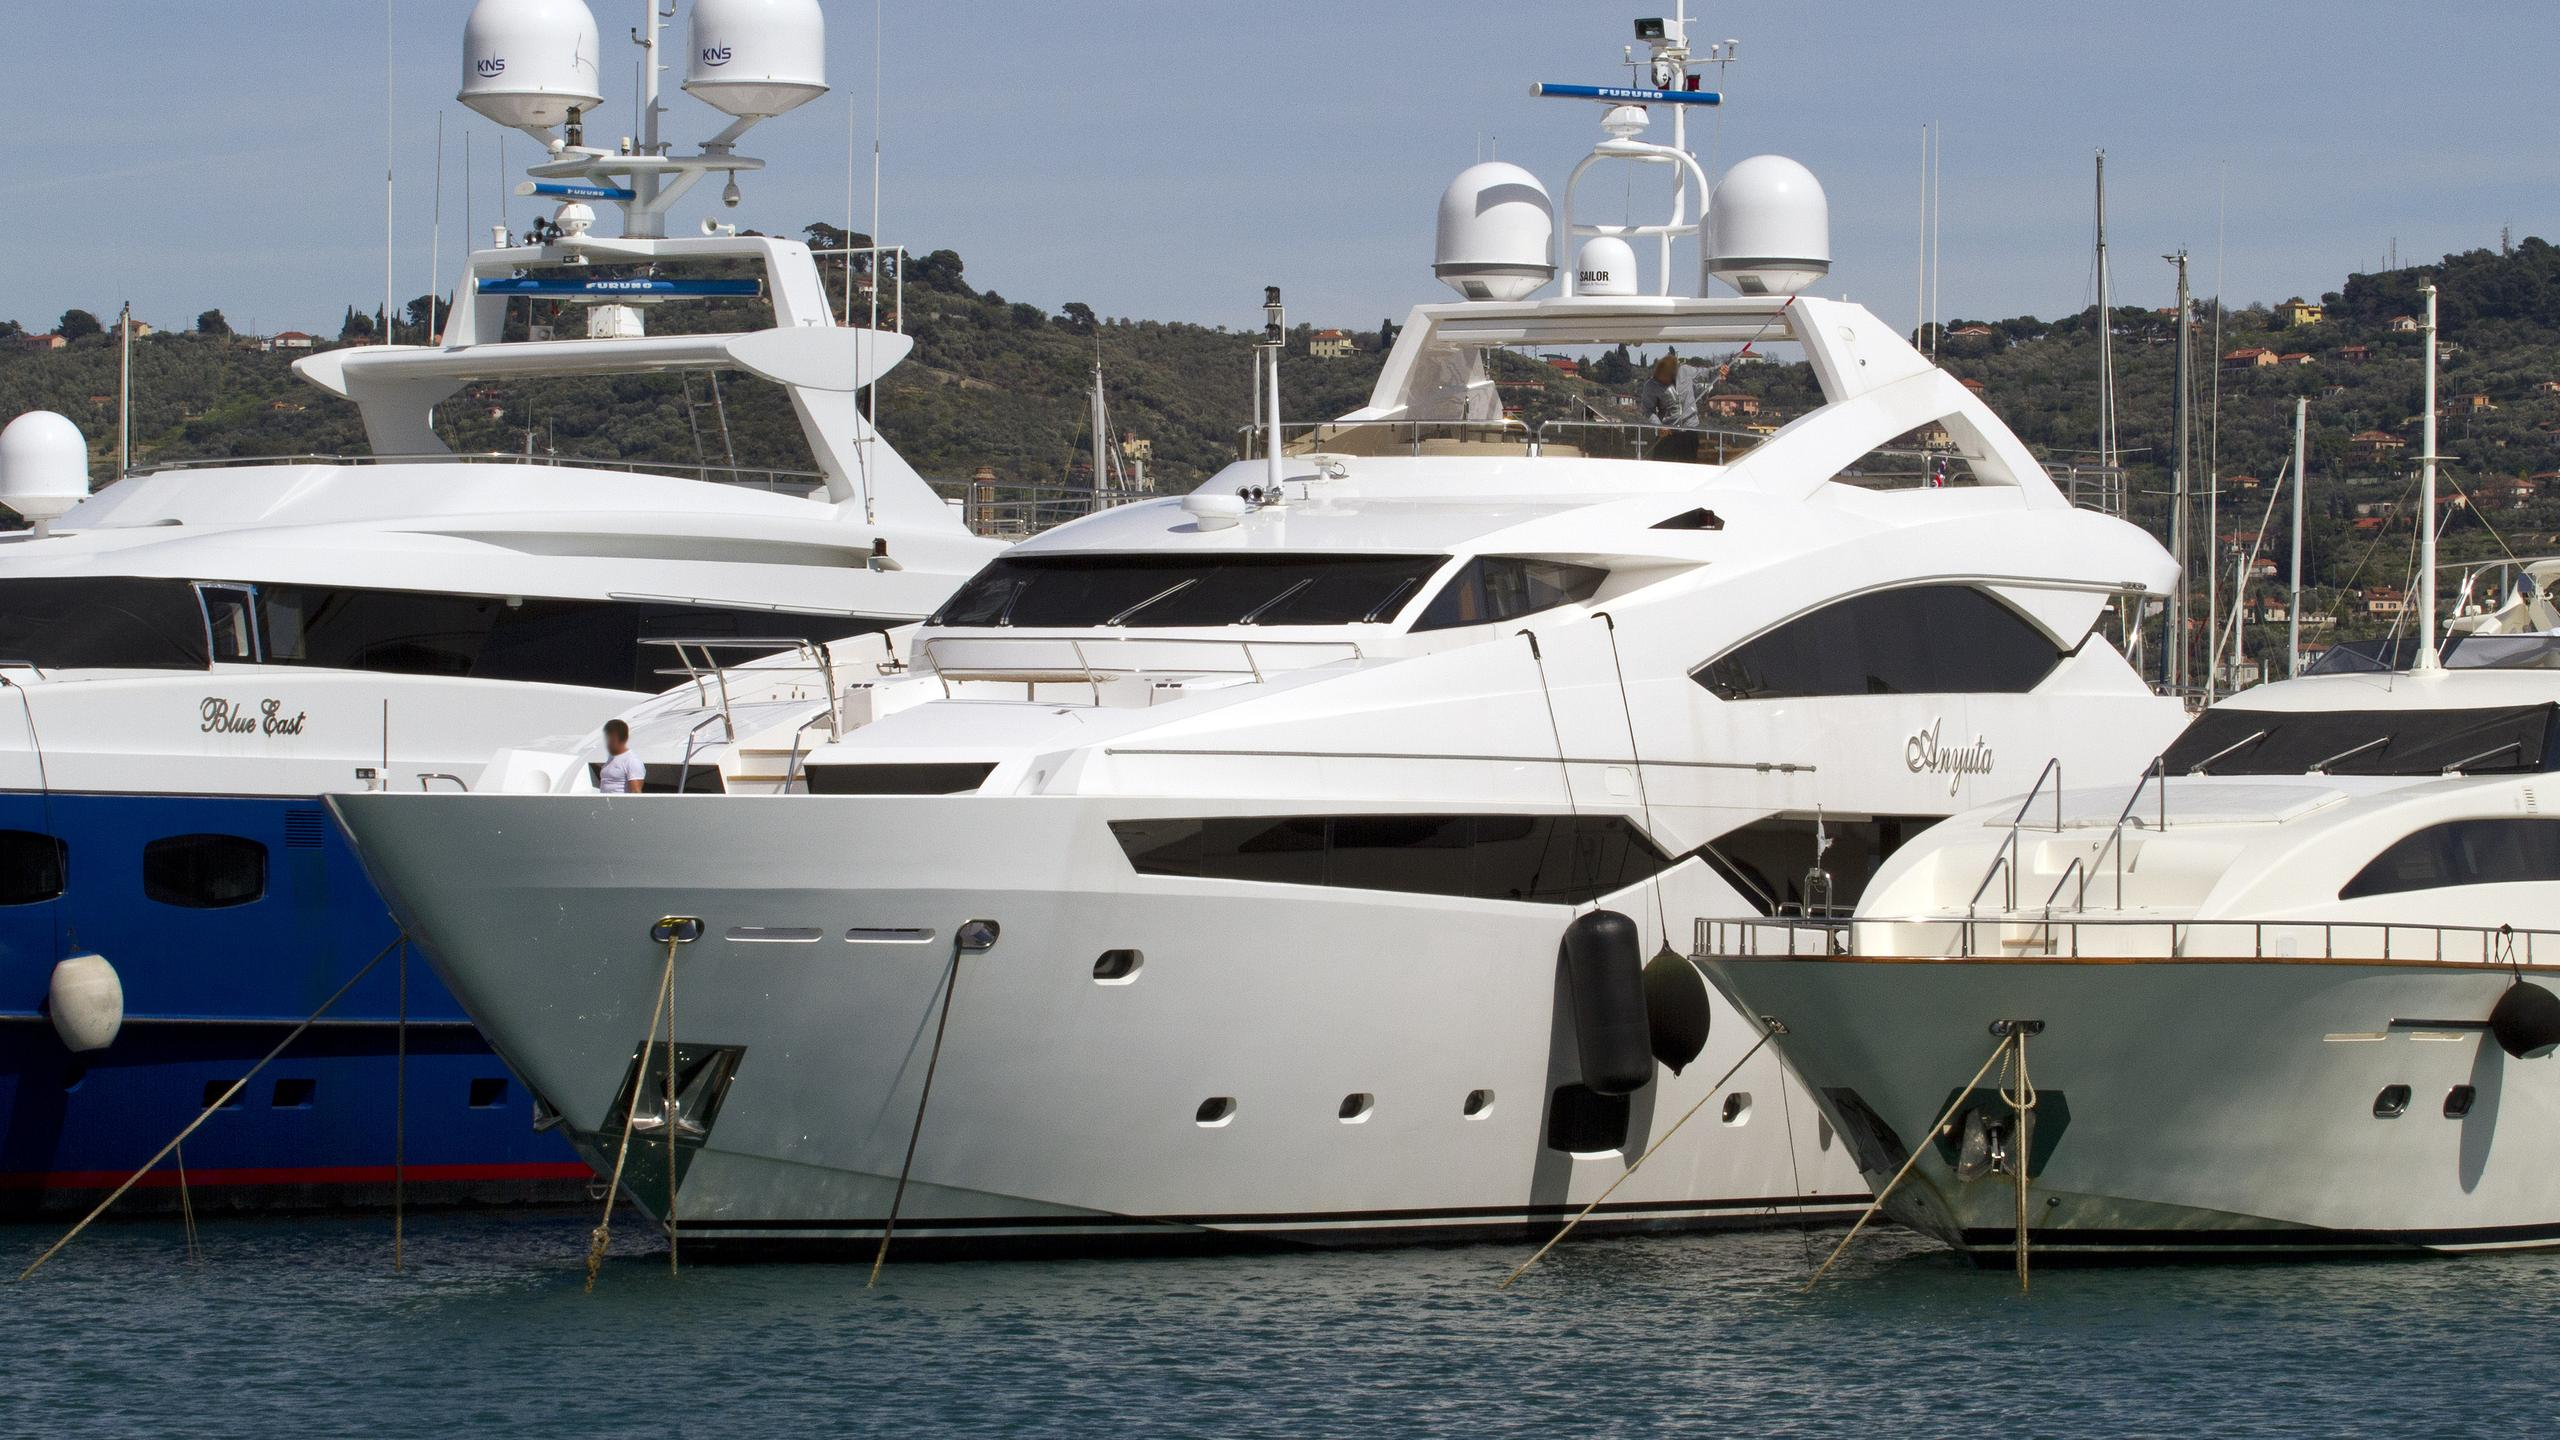 anyuta-motor-yacht-sunseeker-40m-2014-moored